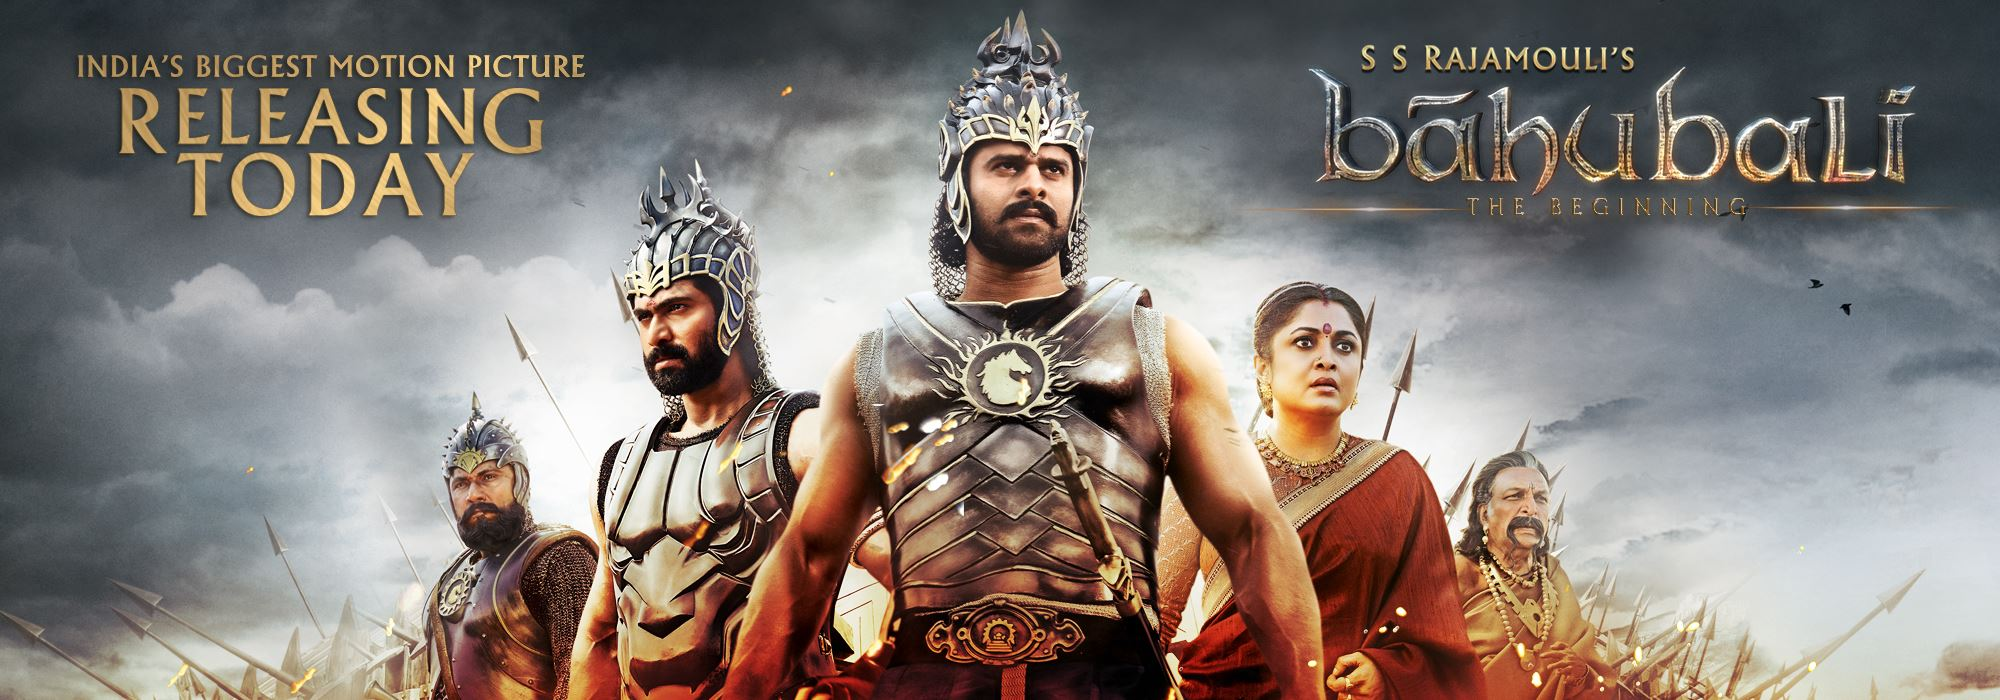 Prabhas Baahubali Movie Wallpapers Ultra HD   25CineFrames